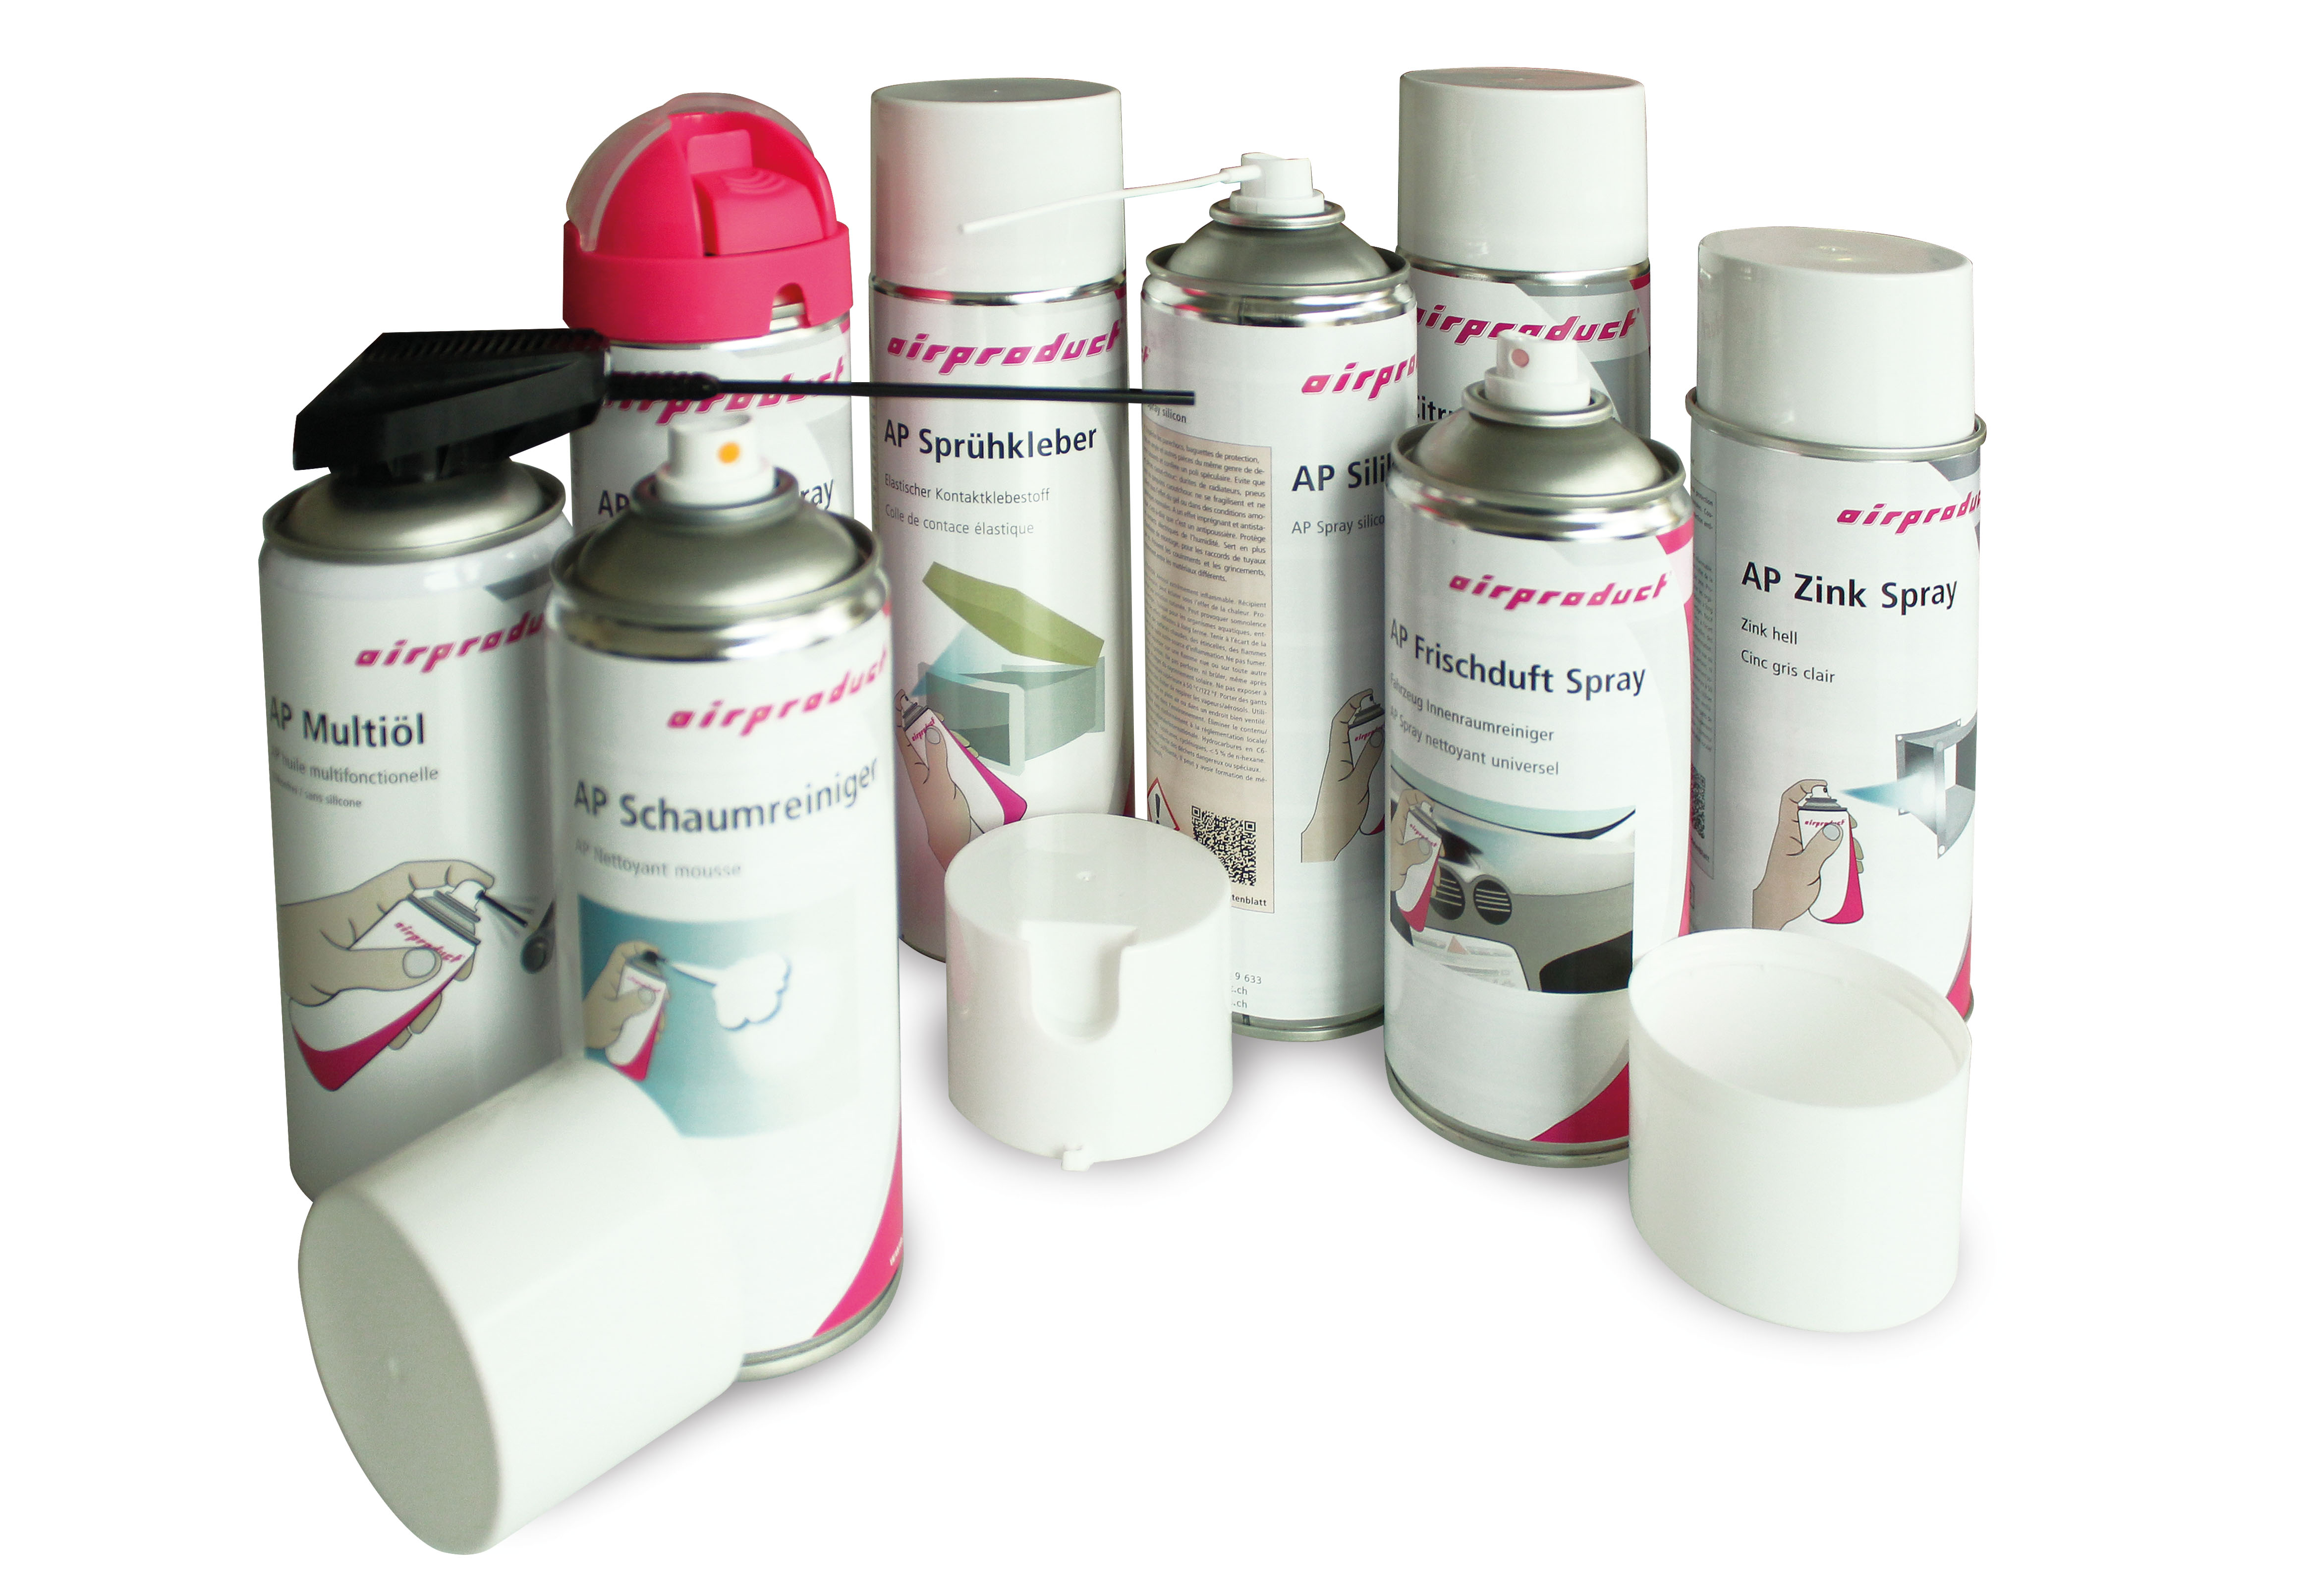 Airproduct Sprays